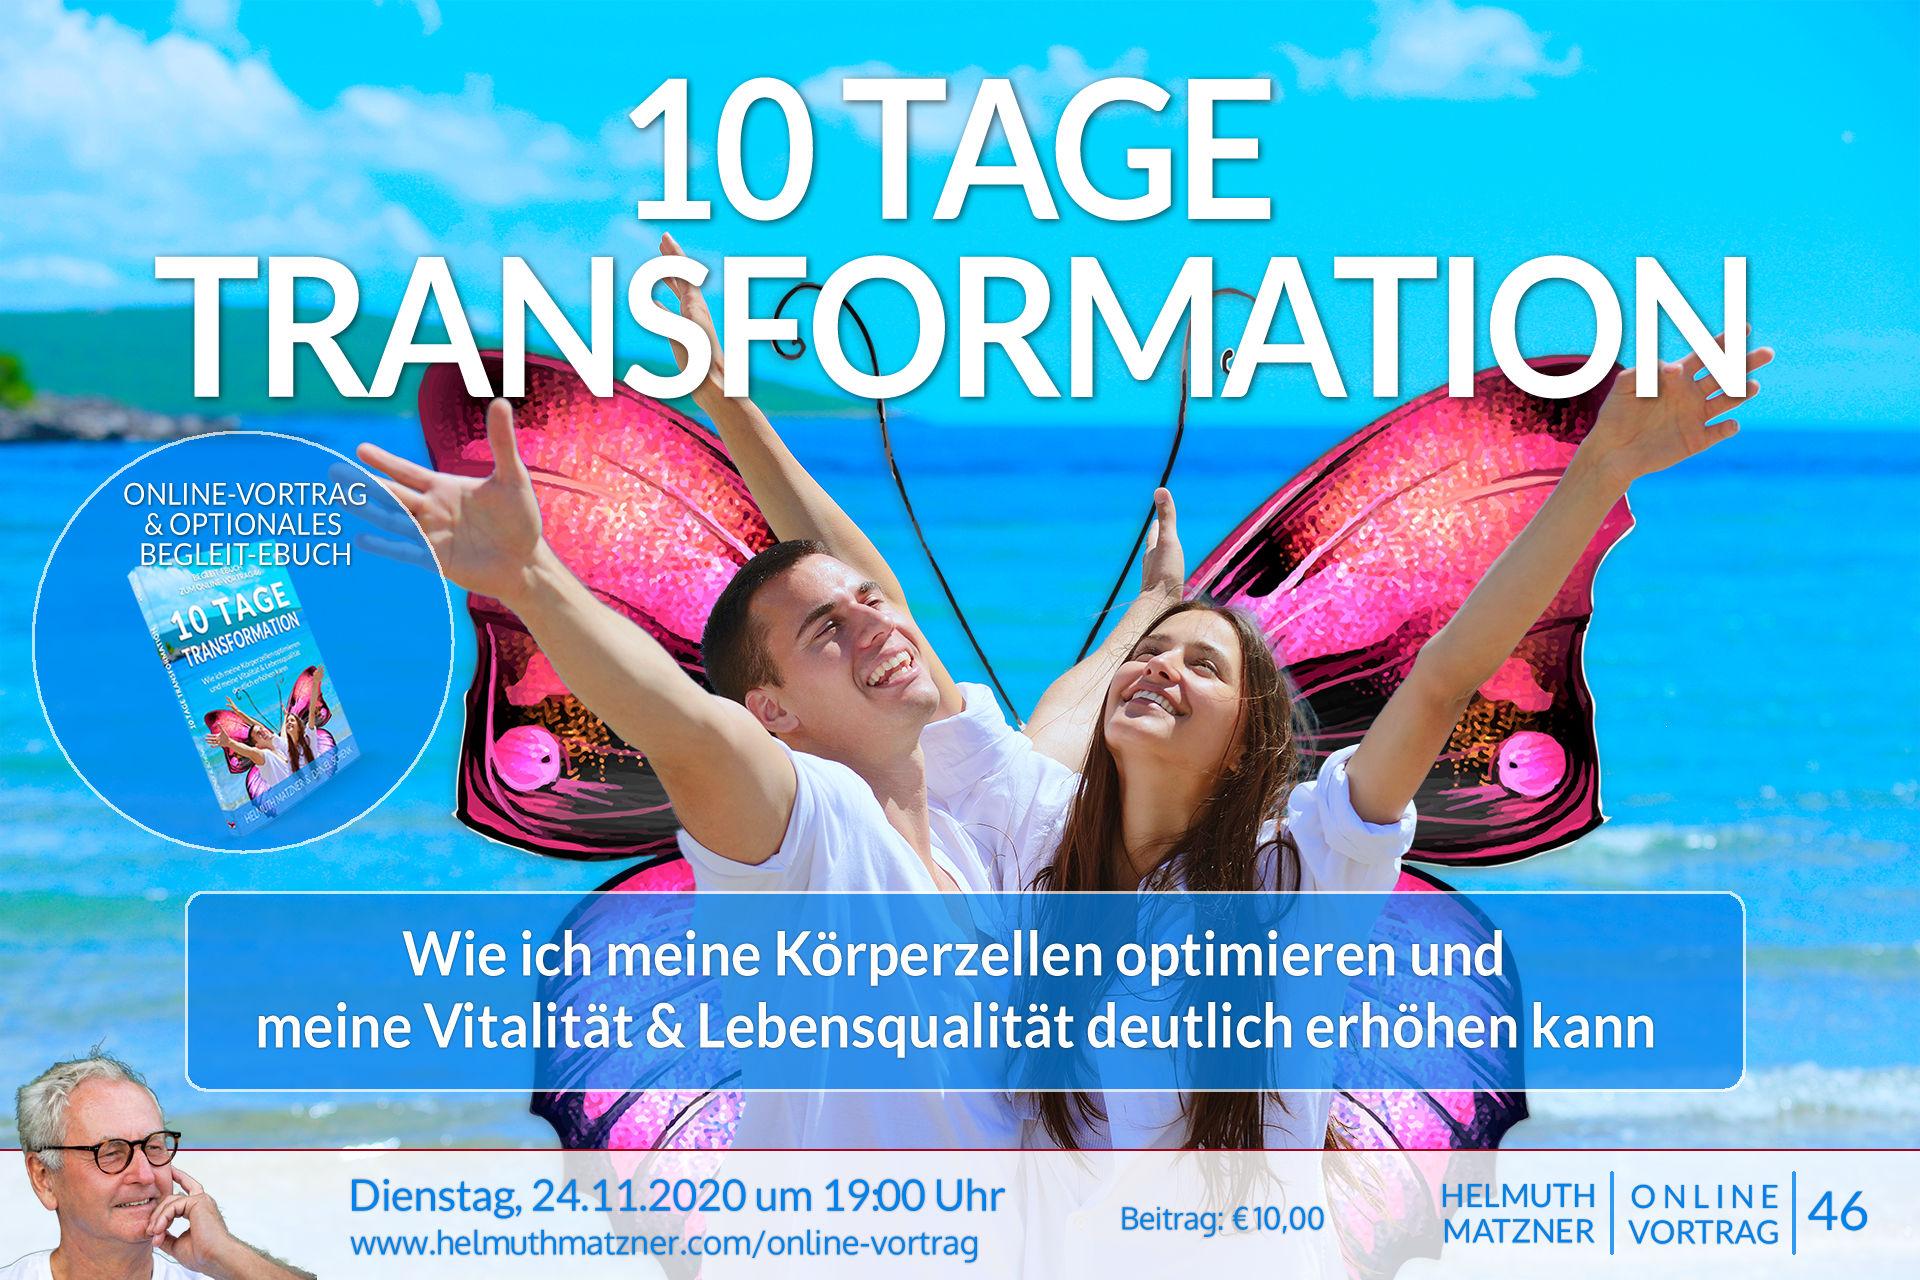 Helmuth Matzner - Online-Vortrag 46 - 10 Tage Transformation - Banner v01B